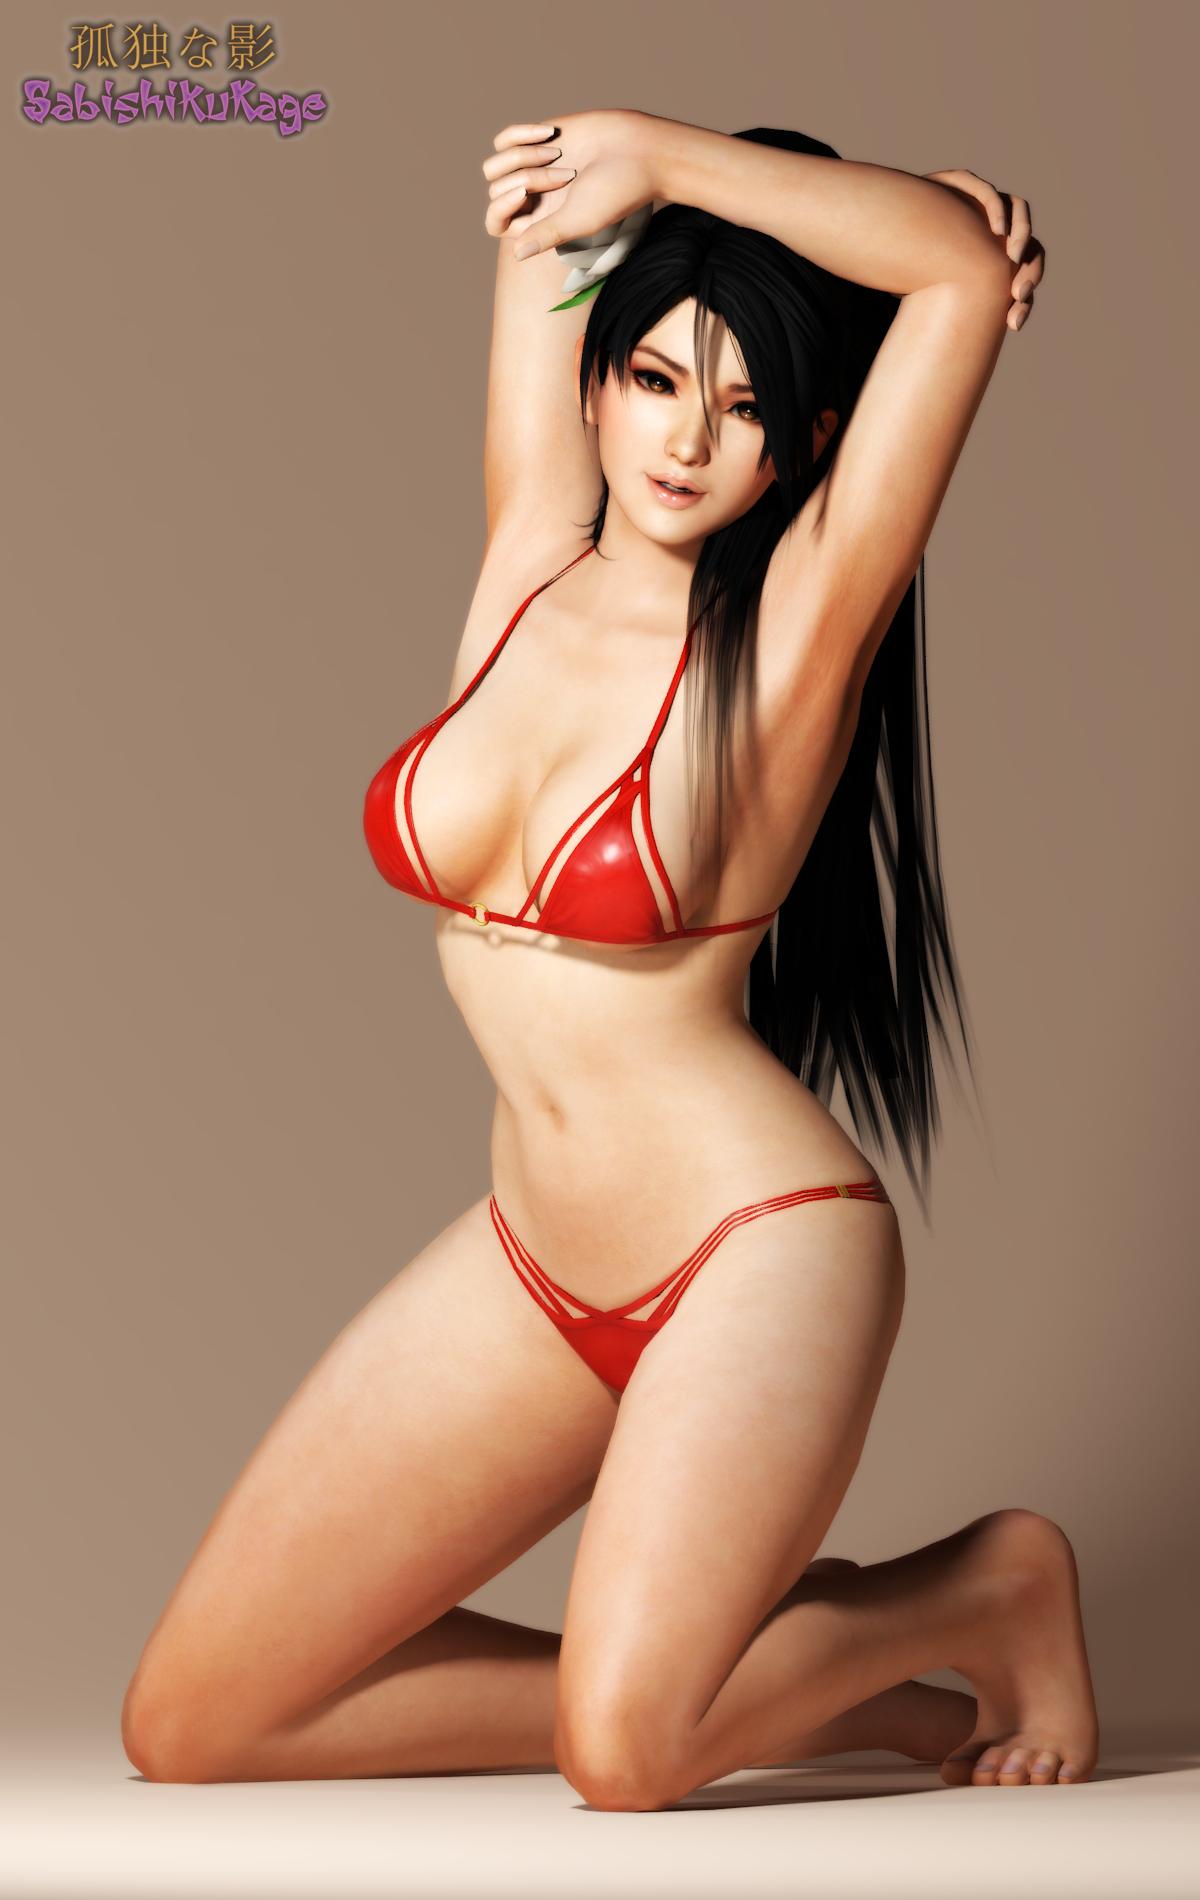 Bikini Claire Hutching nudes (13 photos), Tits, Cleavage, Feet, bra 2020